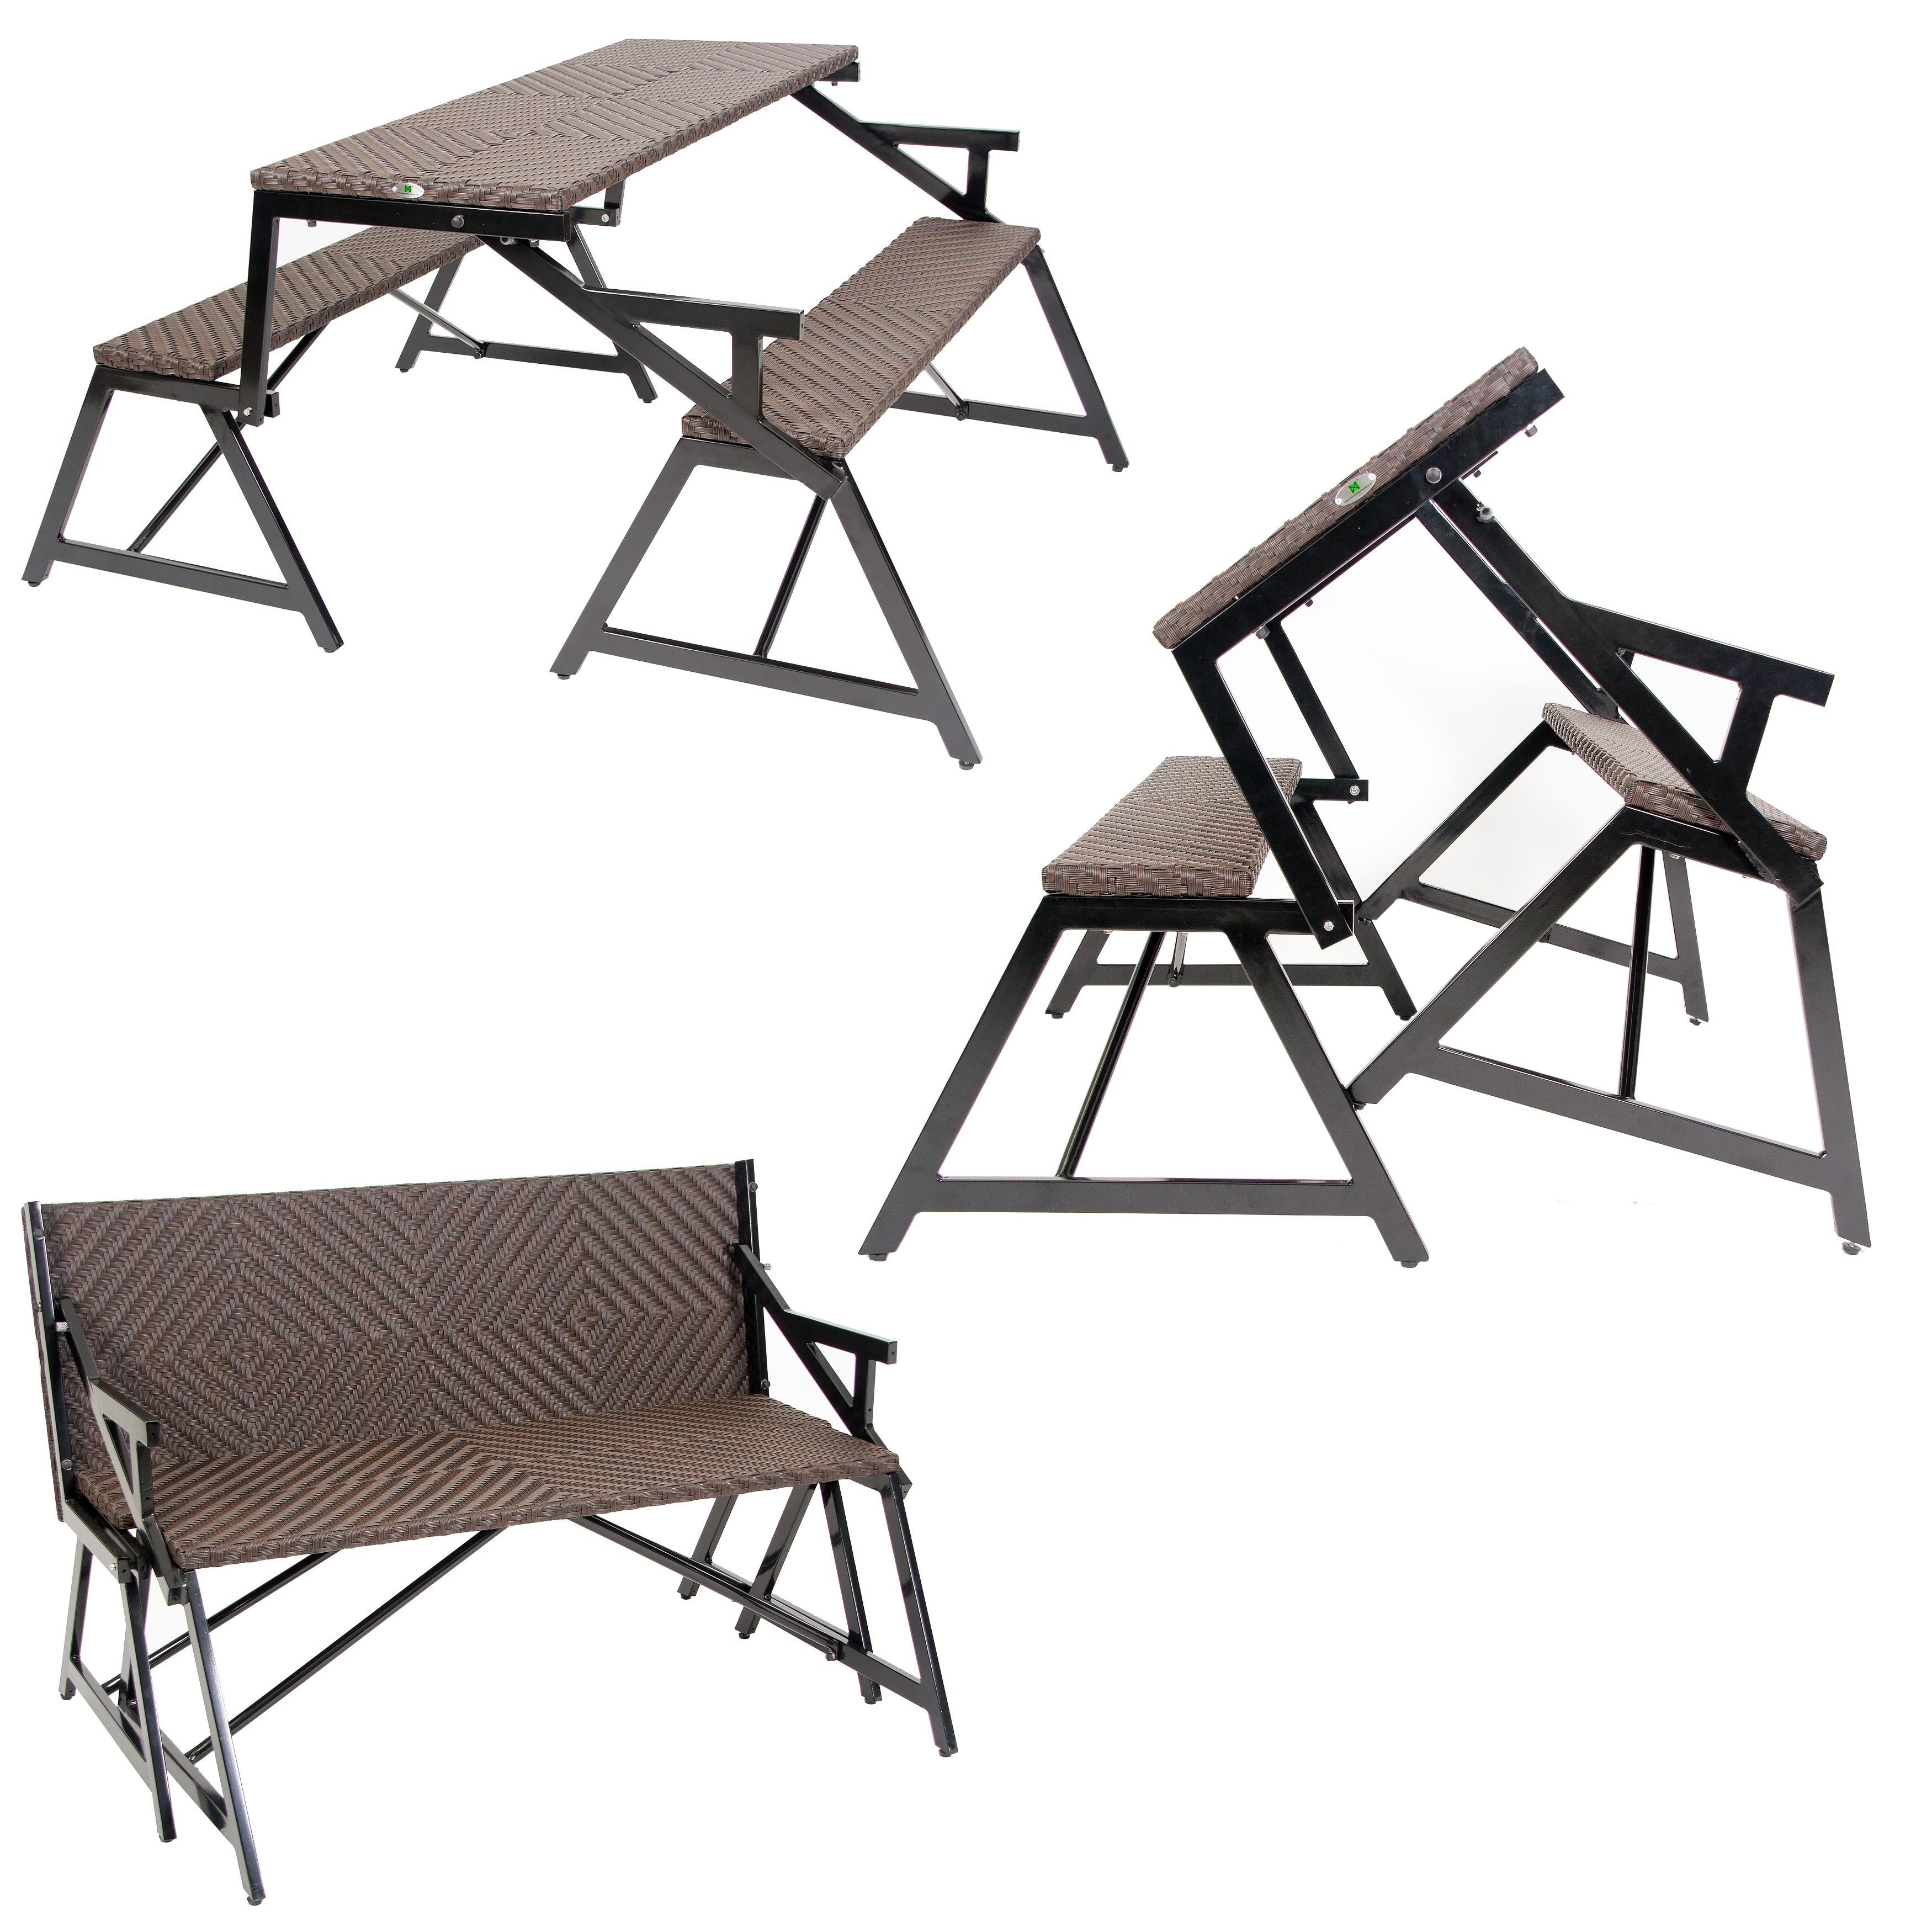 Matrix Vero Outdoor Synthetic Rattan Bench Convertible Picnic Table at Sears.com